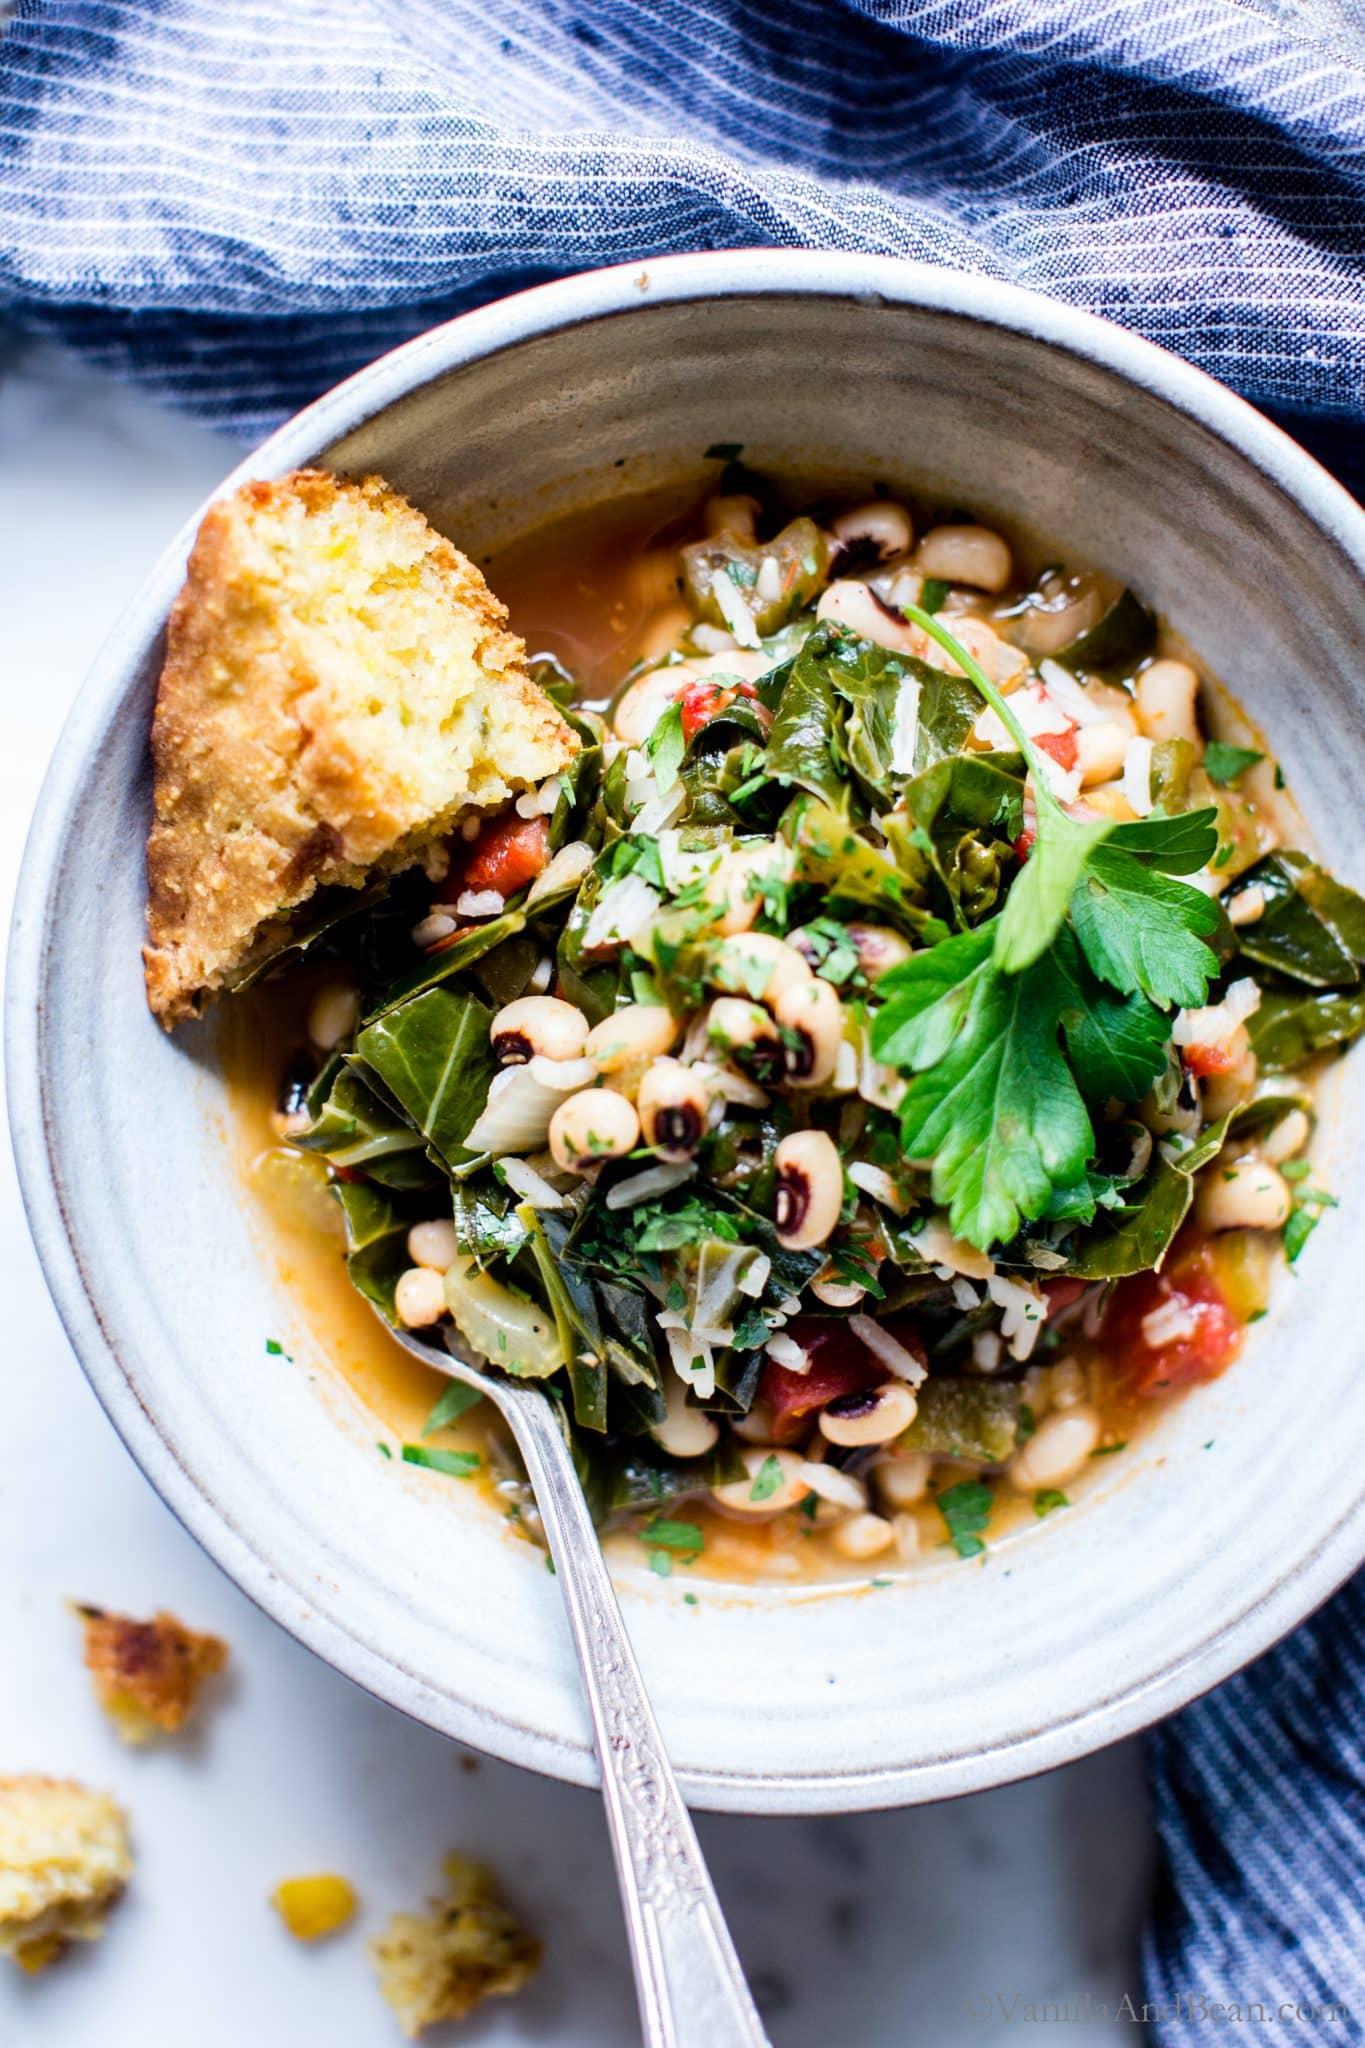 Hoppin John Stew shared with cornbread in a bowl.